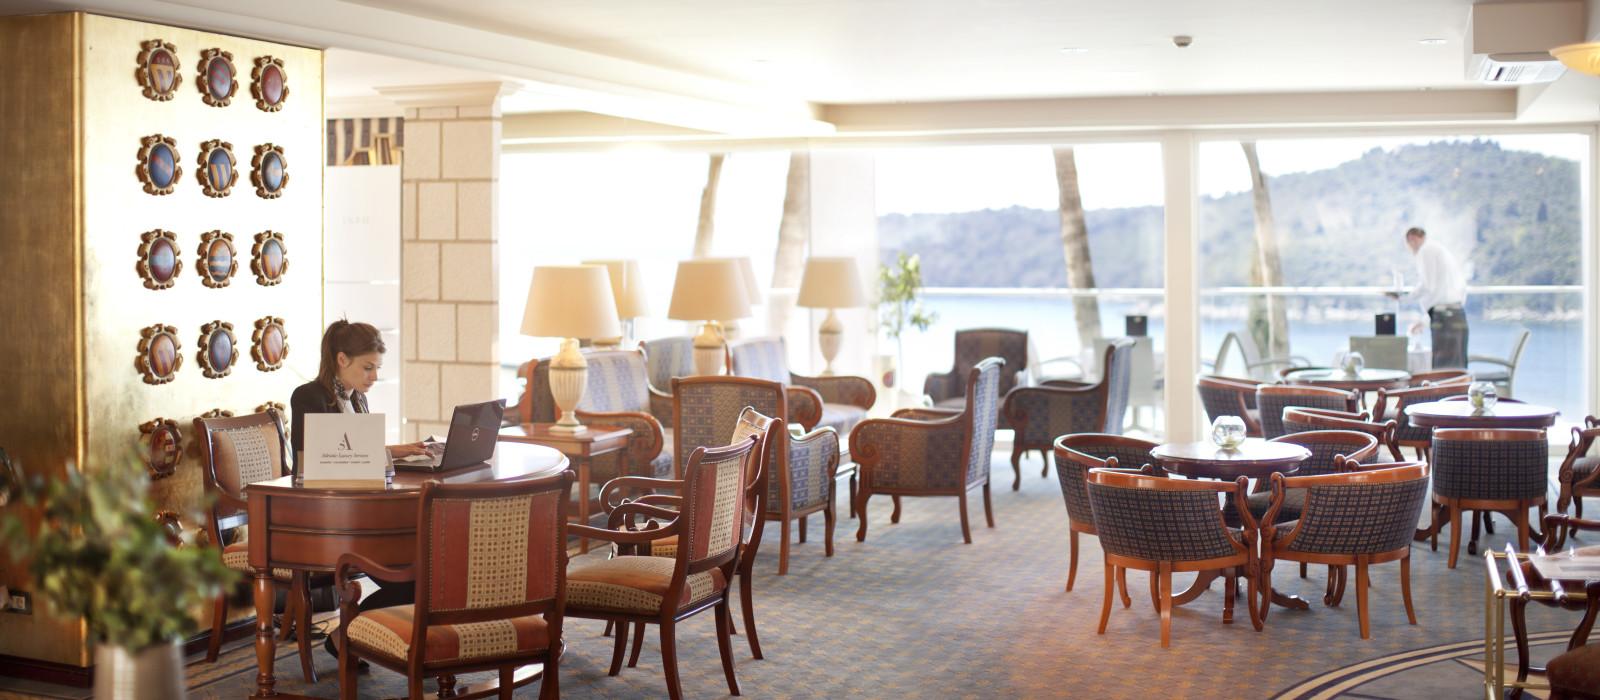 Hotel Villa Argentina Croatia & Slovenia